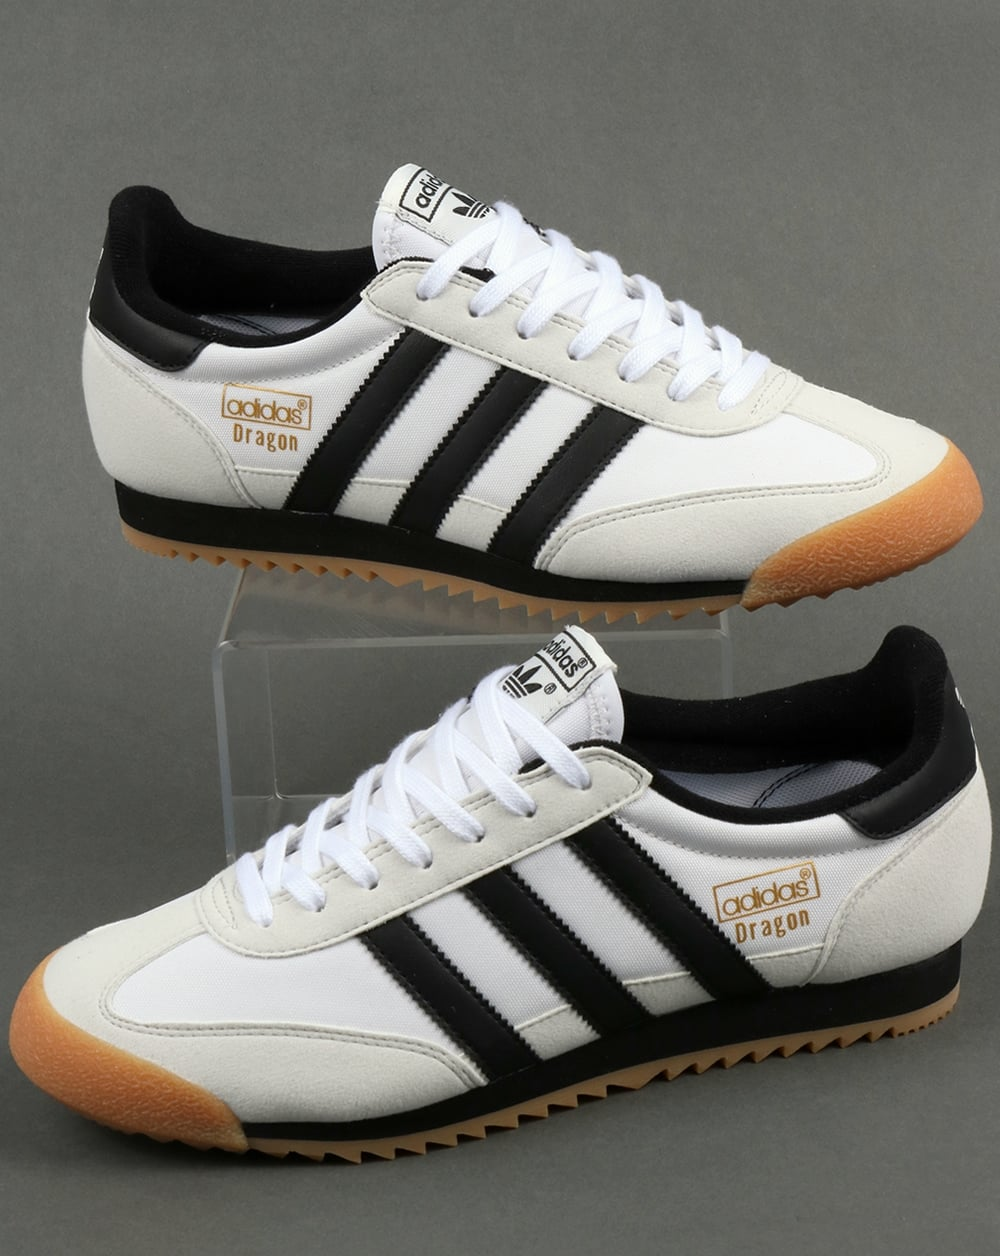 Shoe Company Order Online